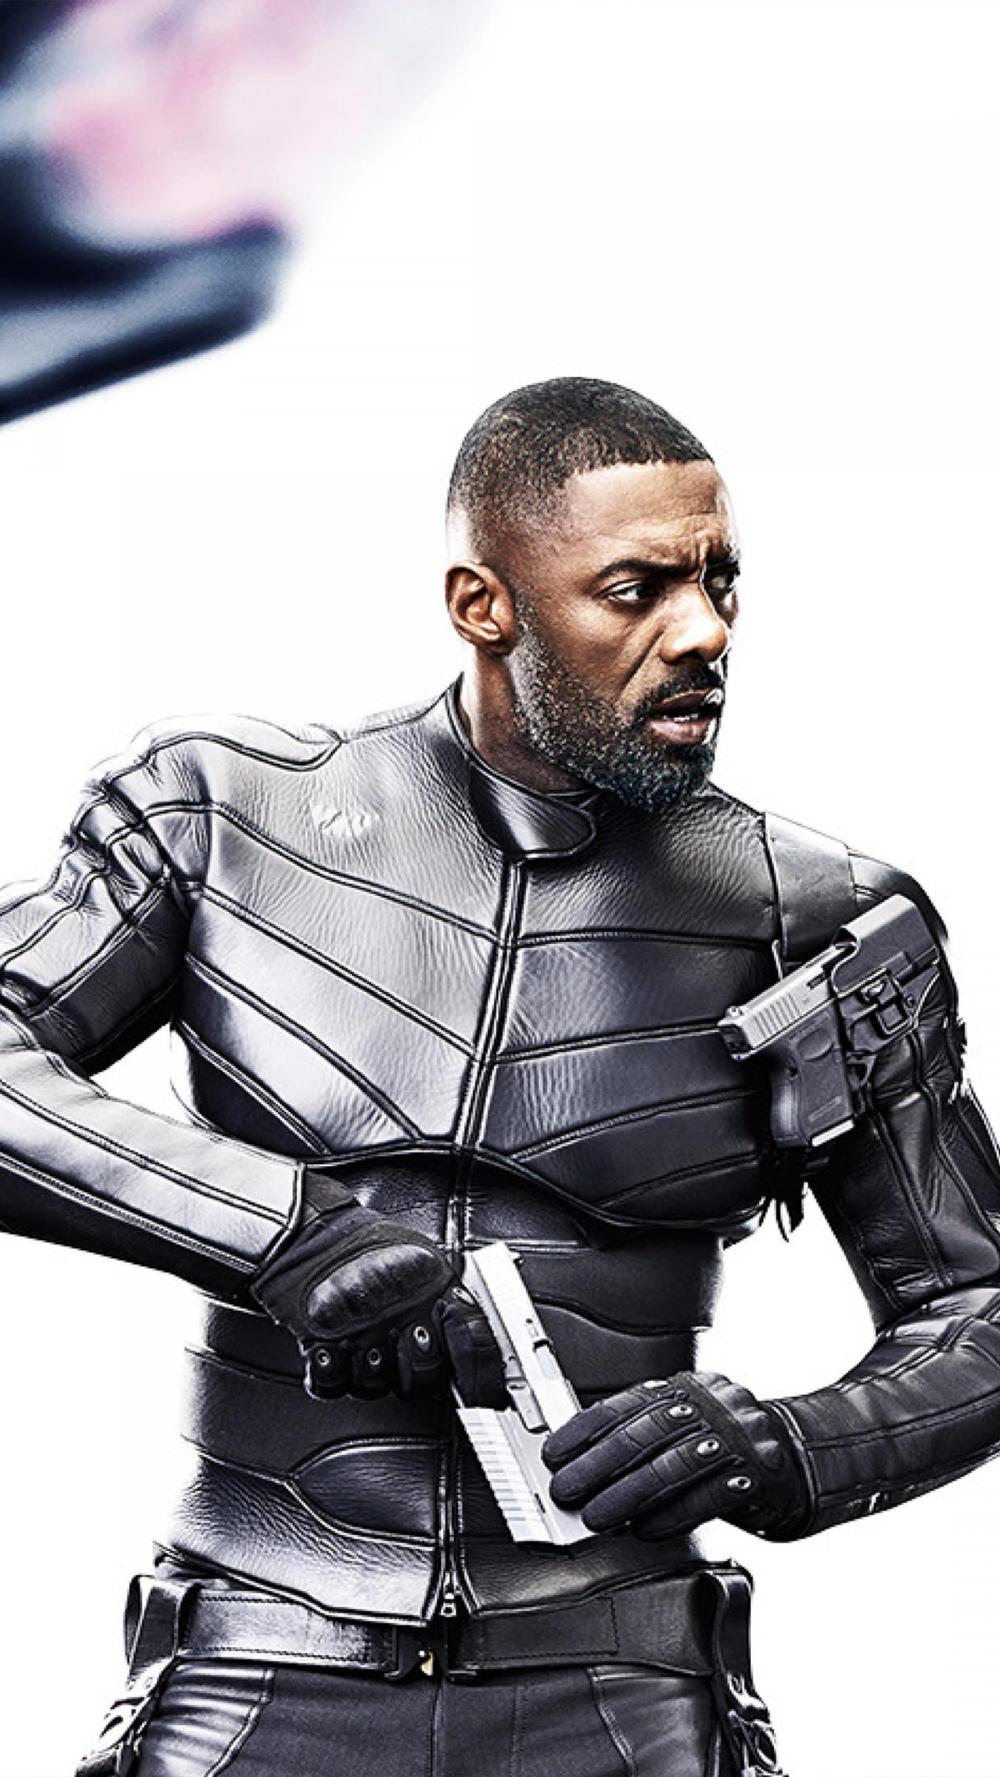 Fast Furious Presents Hobbs Shaw Hd Wallpapers 7wallpapers Net Fast And Furious Movie Fast And Furious Idris Elba